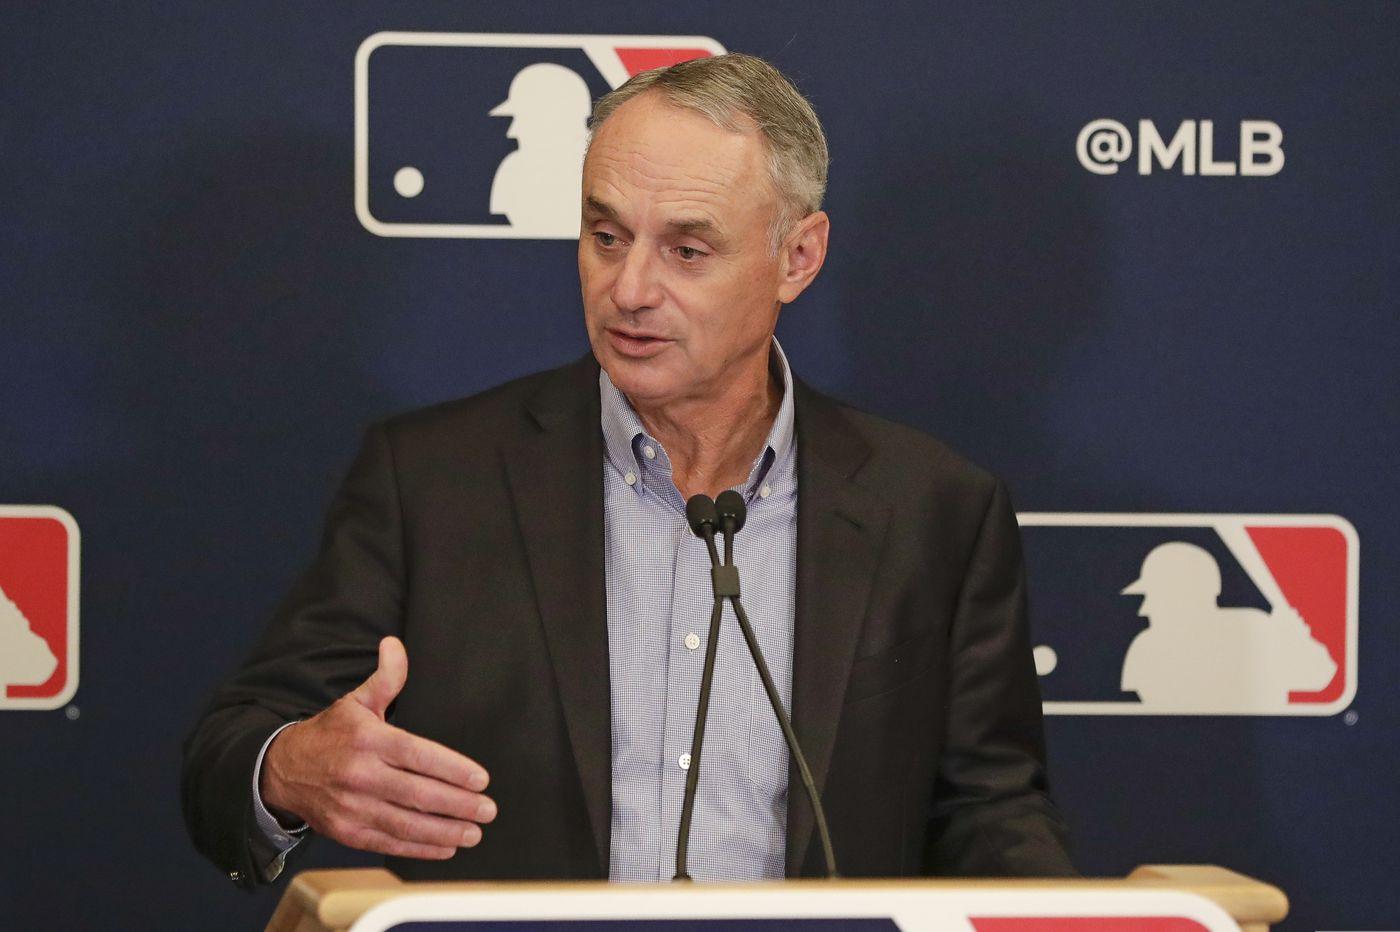 MLB will provide 'interim' financial relief for minor leaguers during coronavirus shutdown